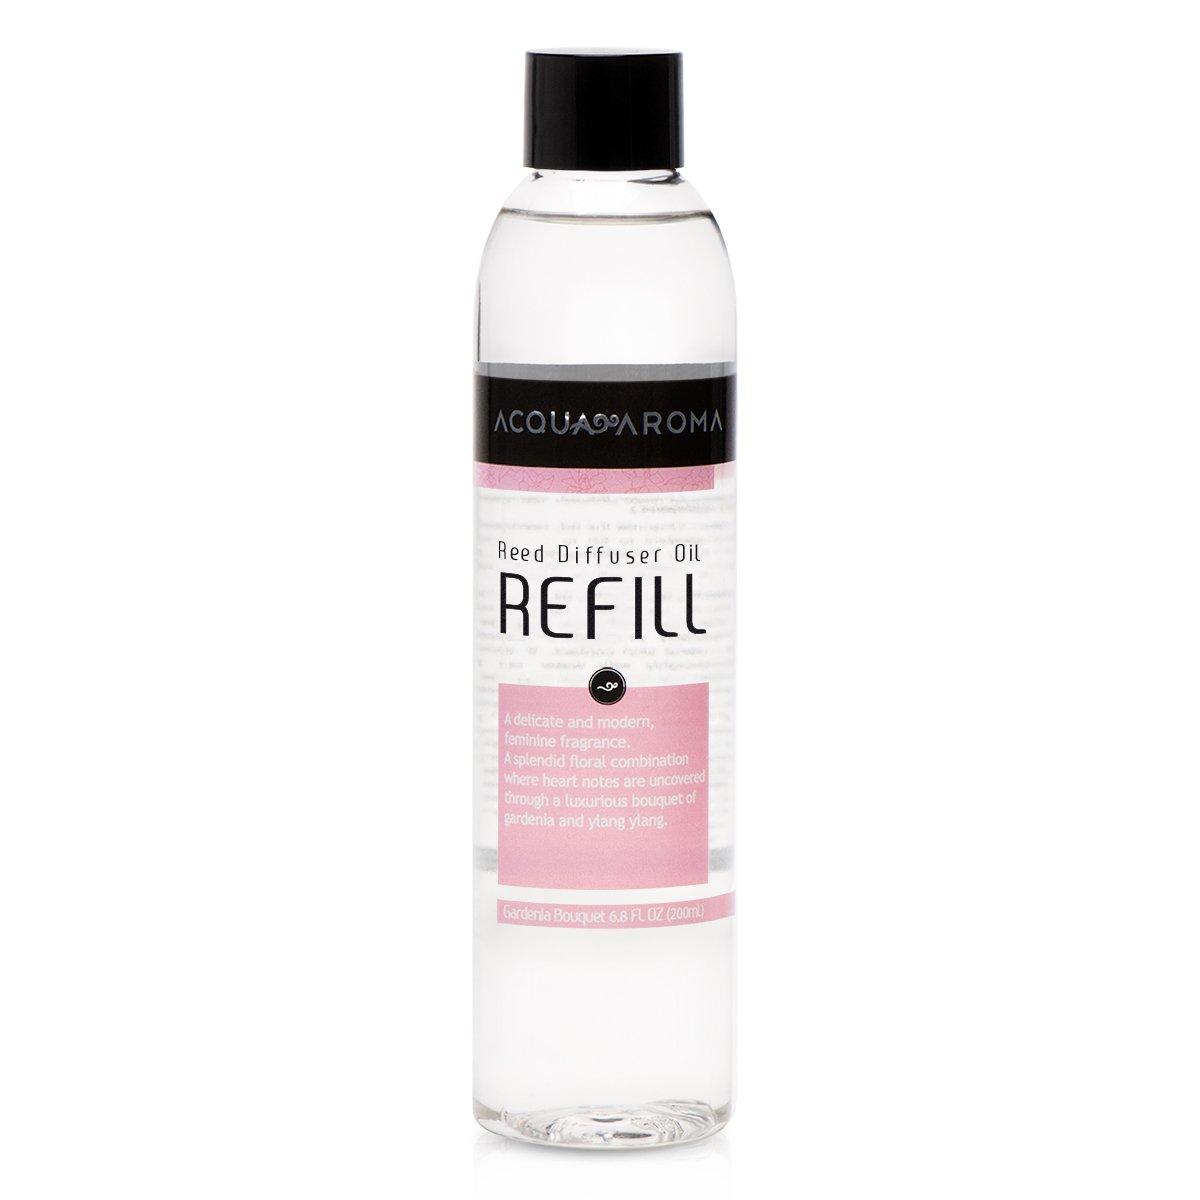 Acqua Aroma Gardenia Bouquet Reed Diffuser Oil Refill 6.8 FL OZ (200ml). Contains Essencial Oils